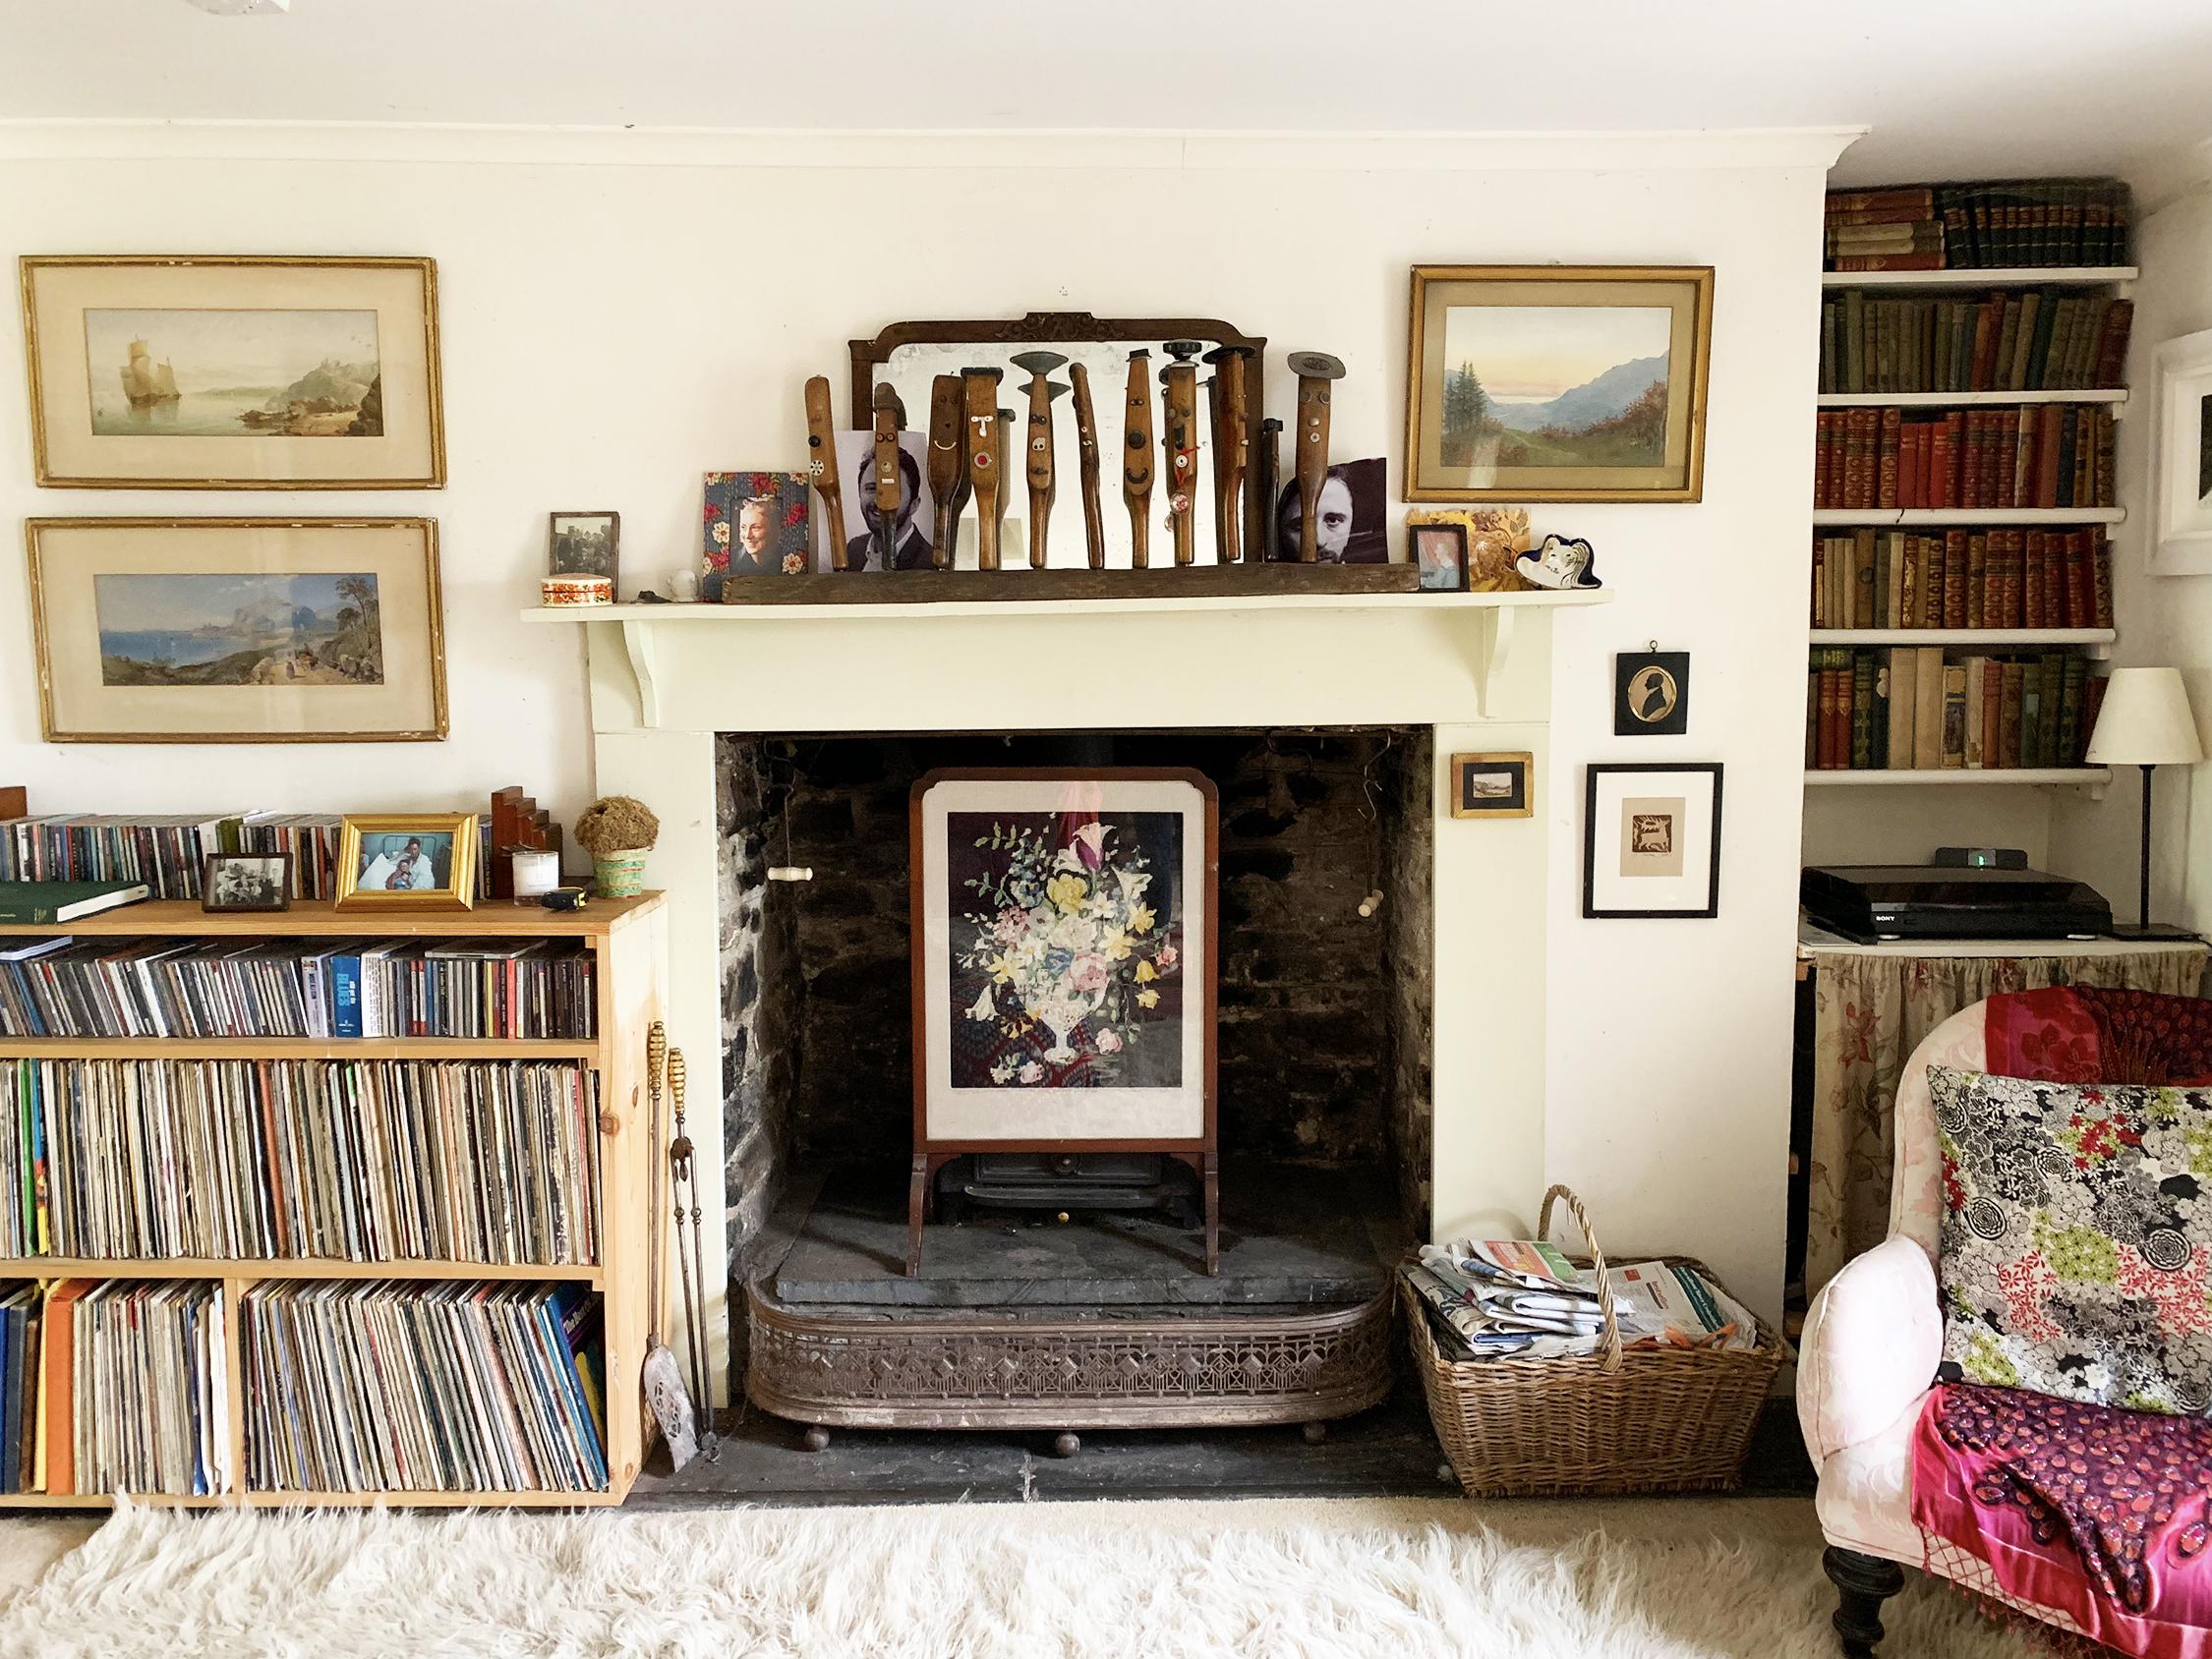 Arabella Shand's home